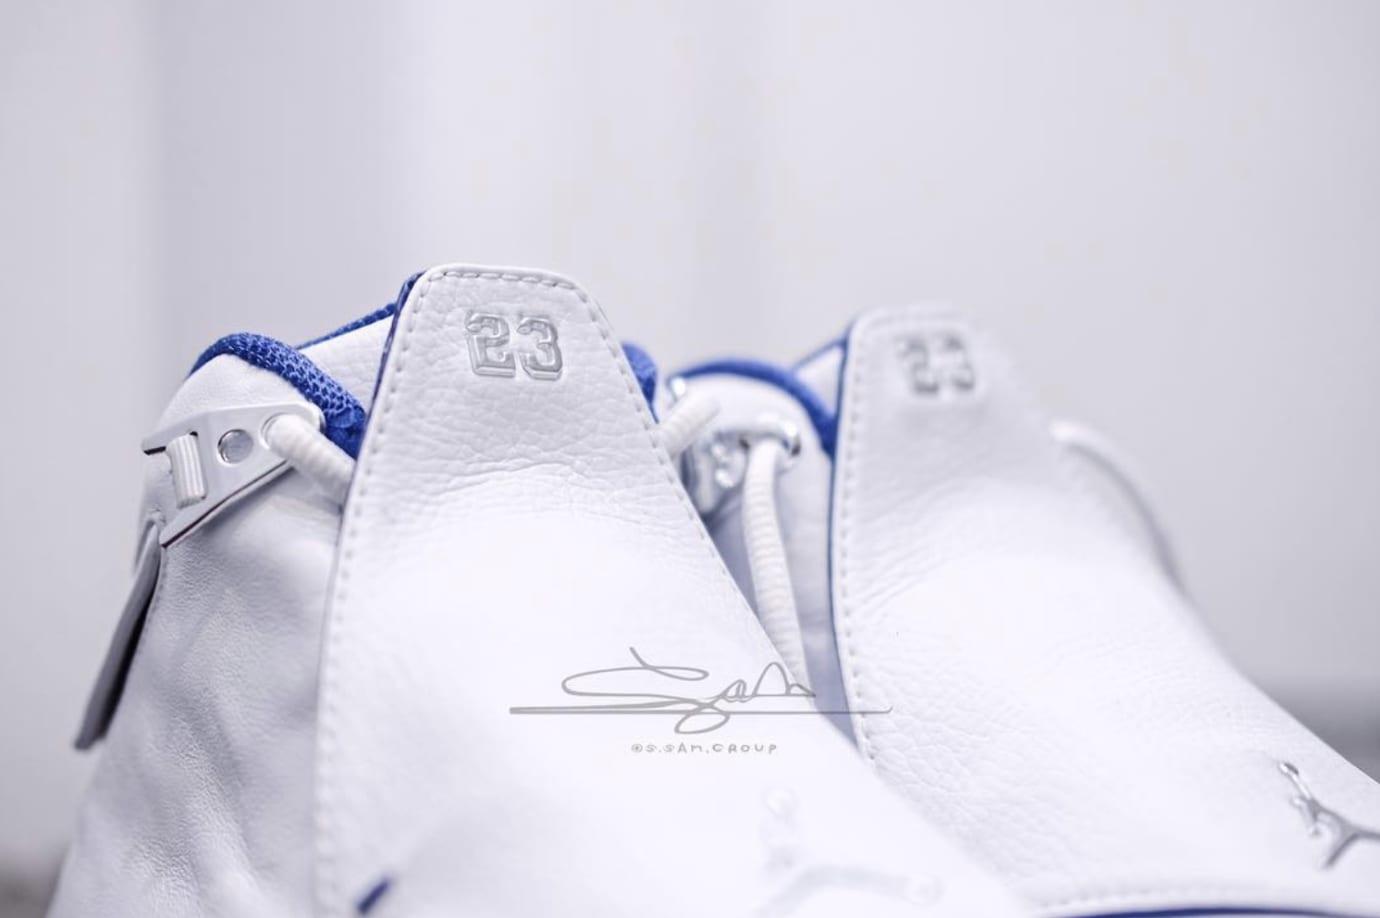 Air Jordan 18 White/Sport Royal-White-Metallic Silver AA2494-106 (Tongue)